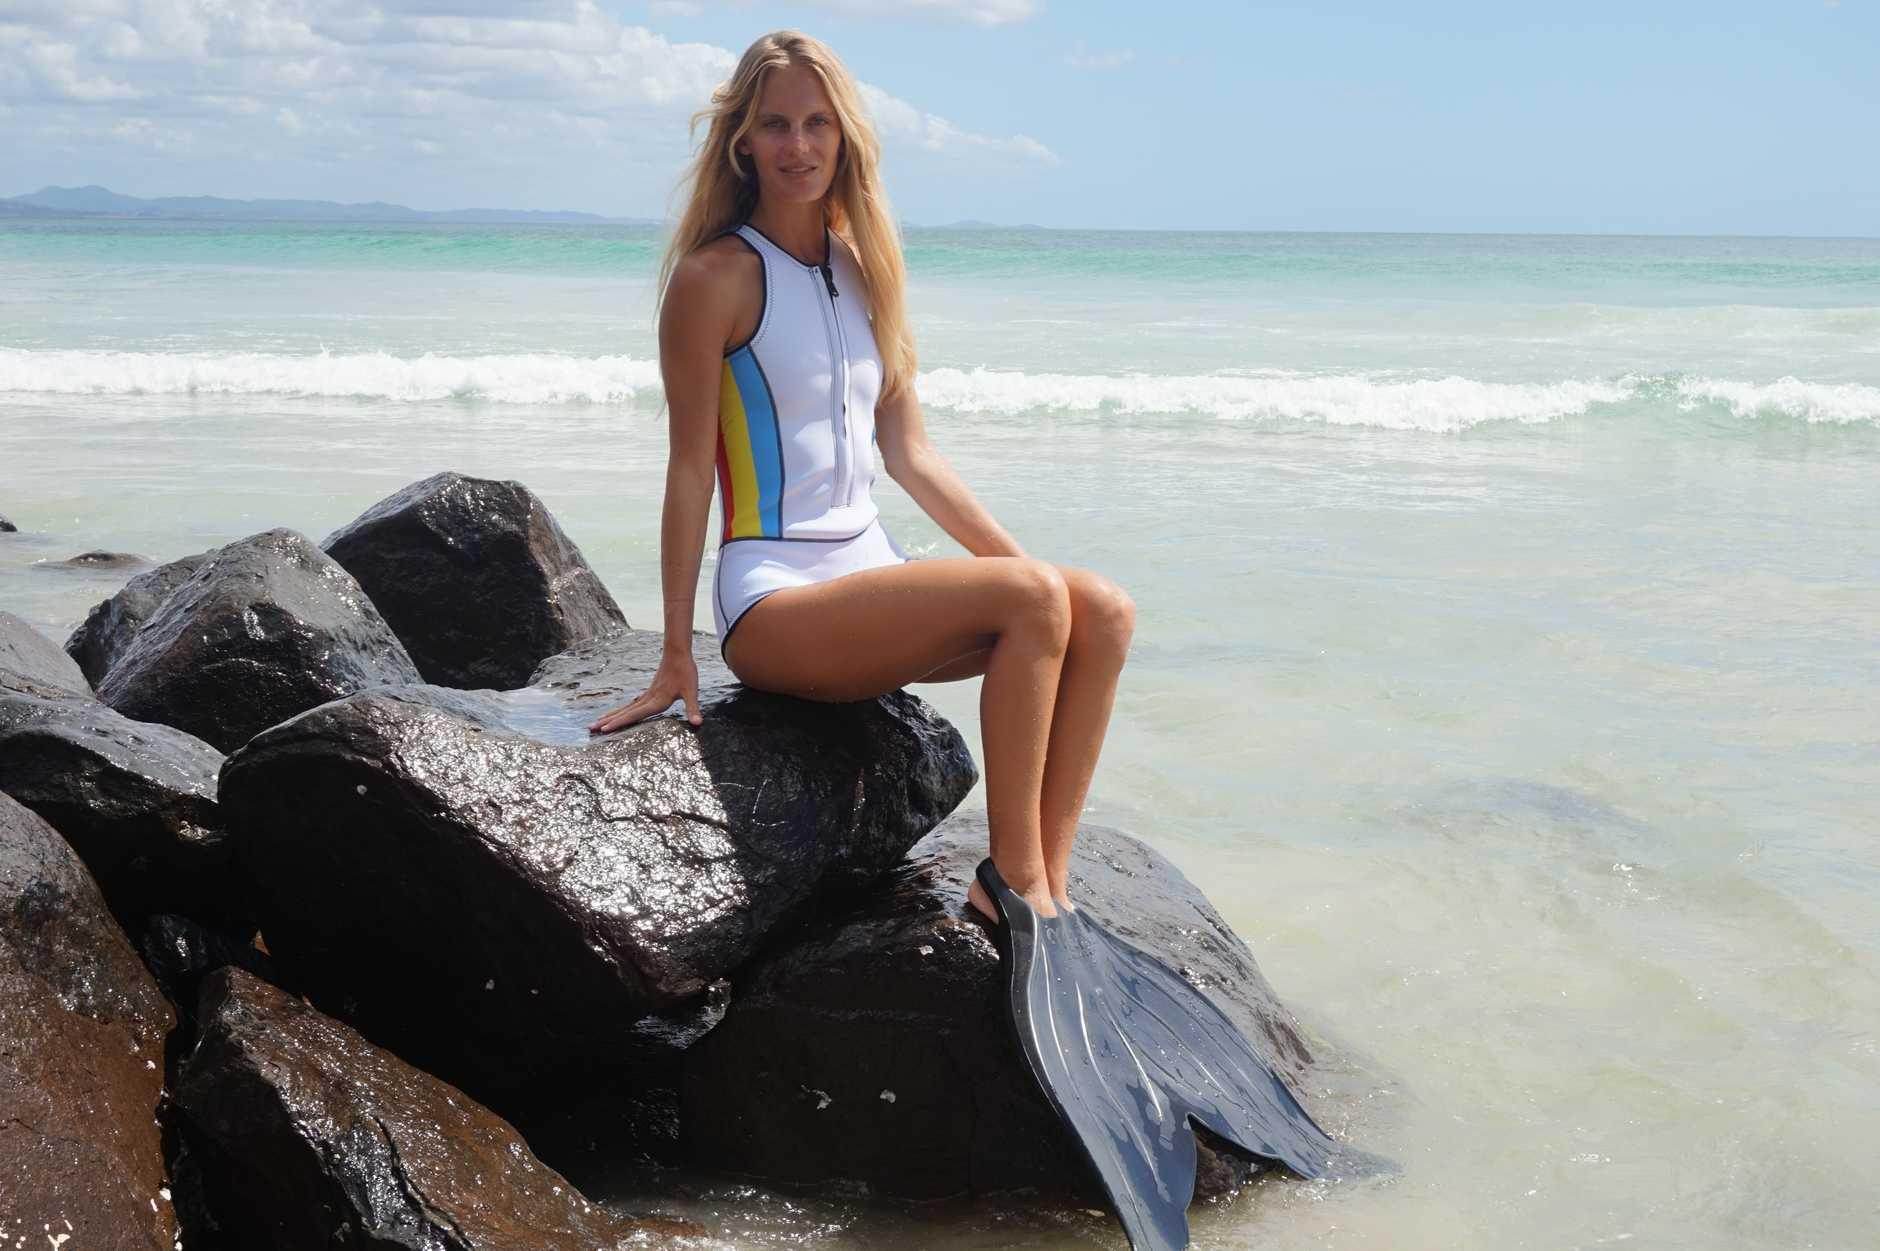 Abysse swimwear co-director Hanalei Reponty models local brand mermaid flippers by Mahina Mer-Fins. Photo by Alina Rylko.